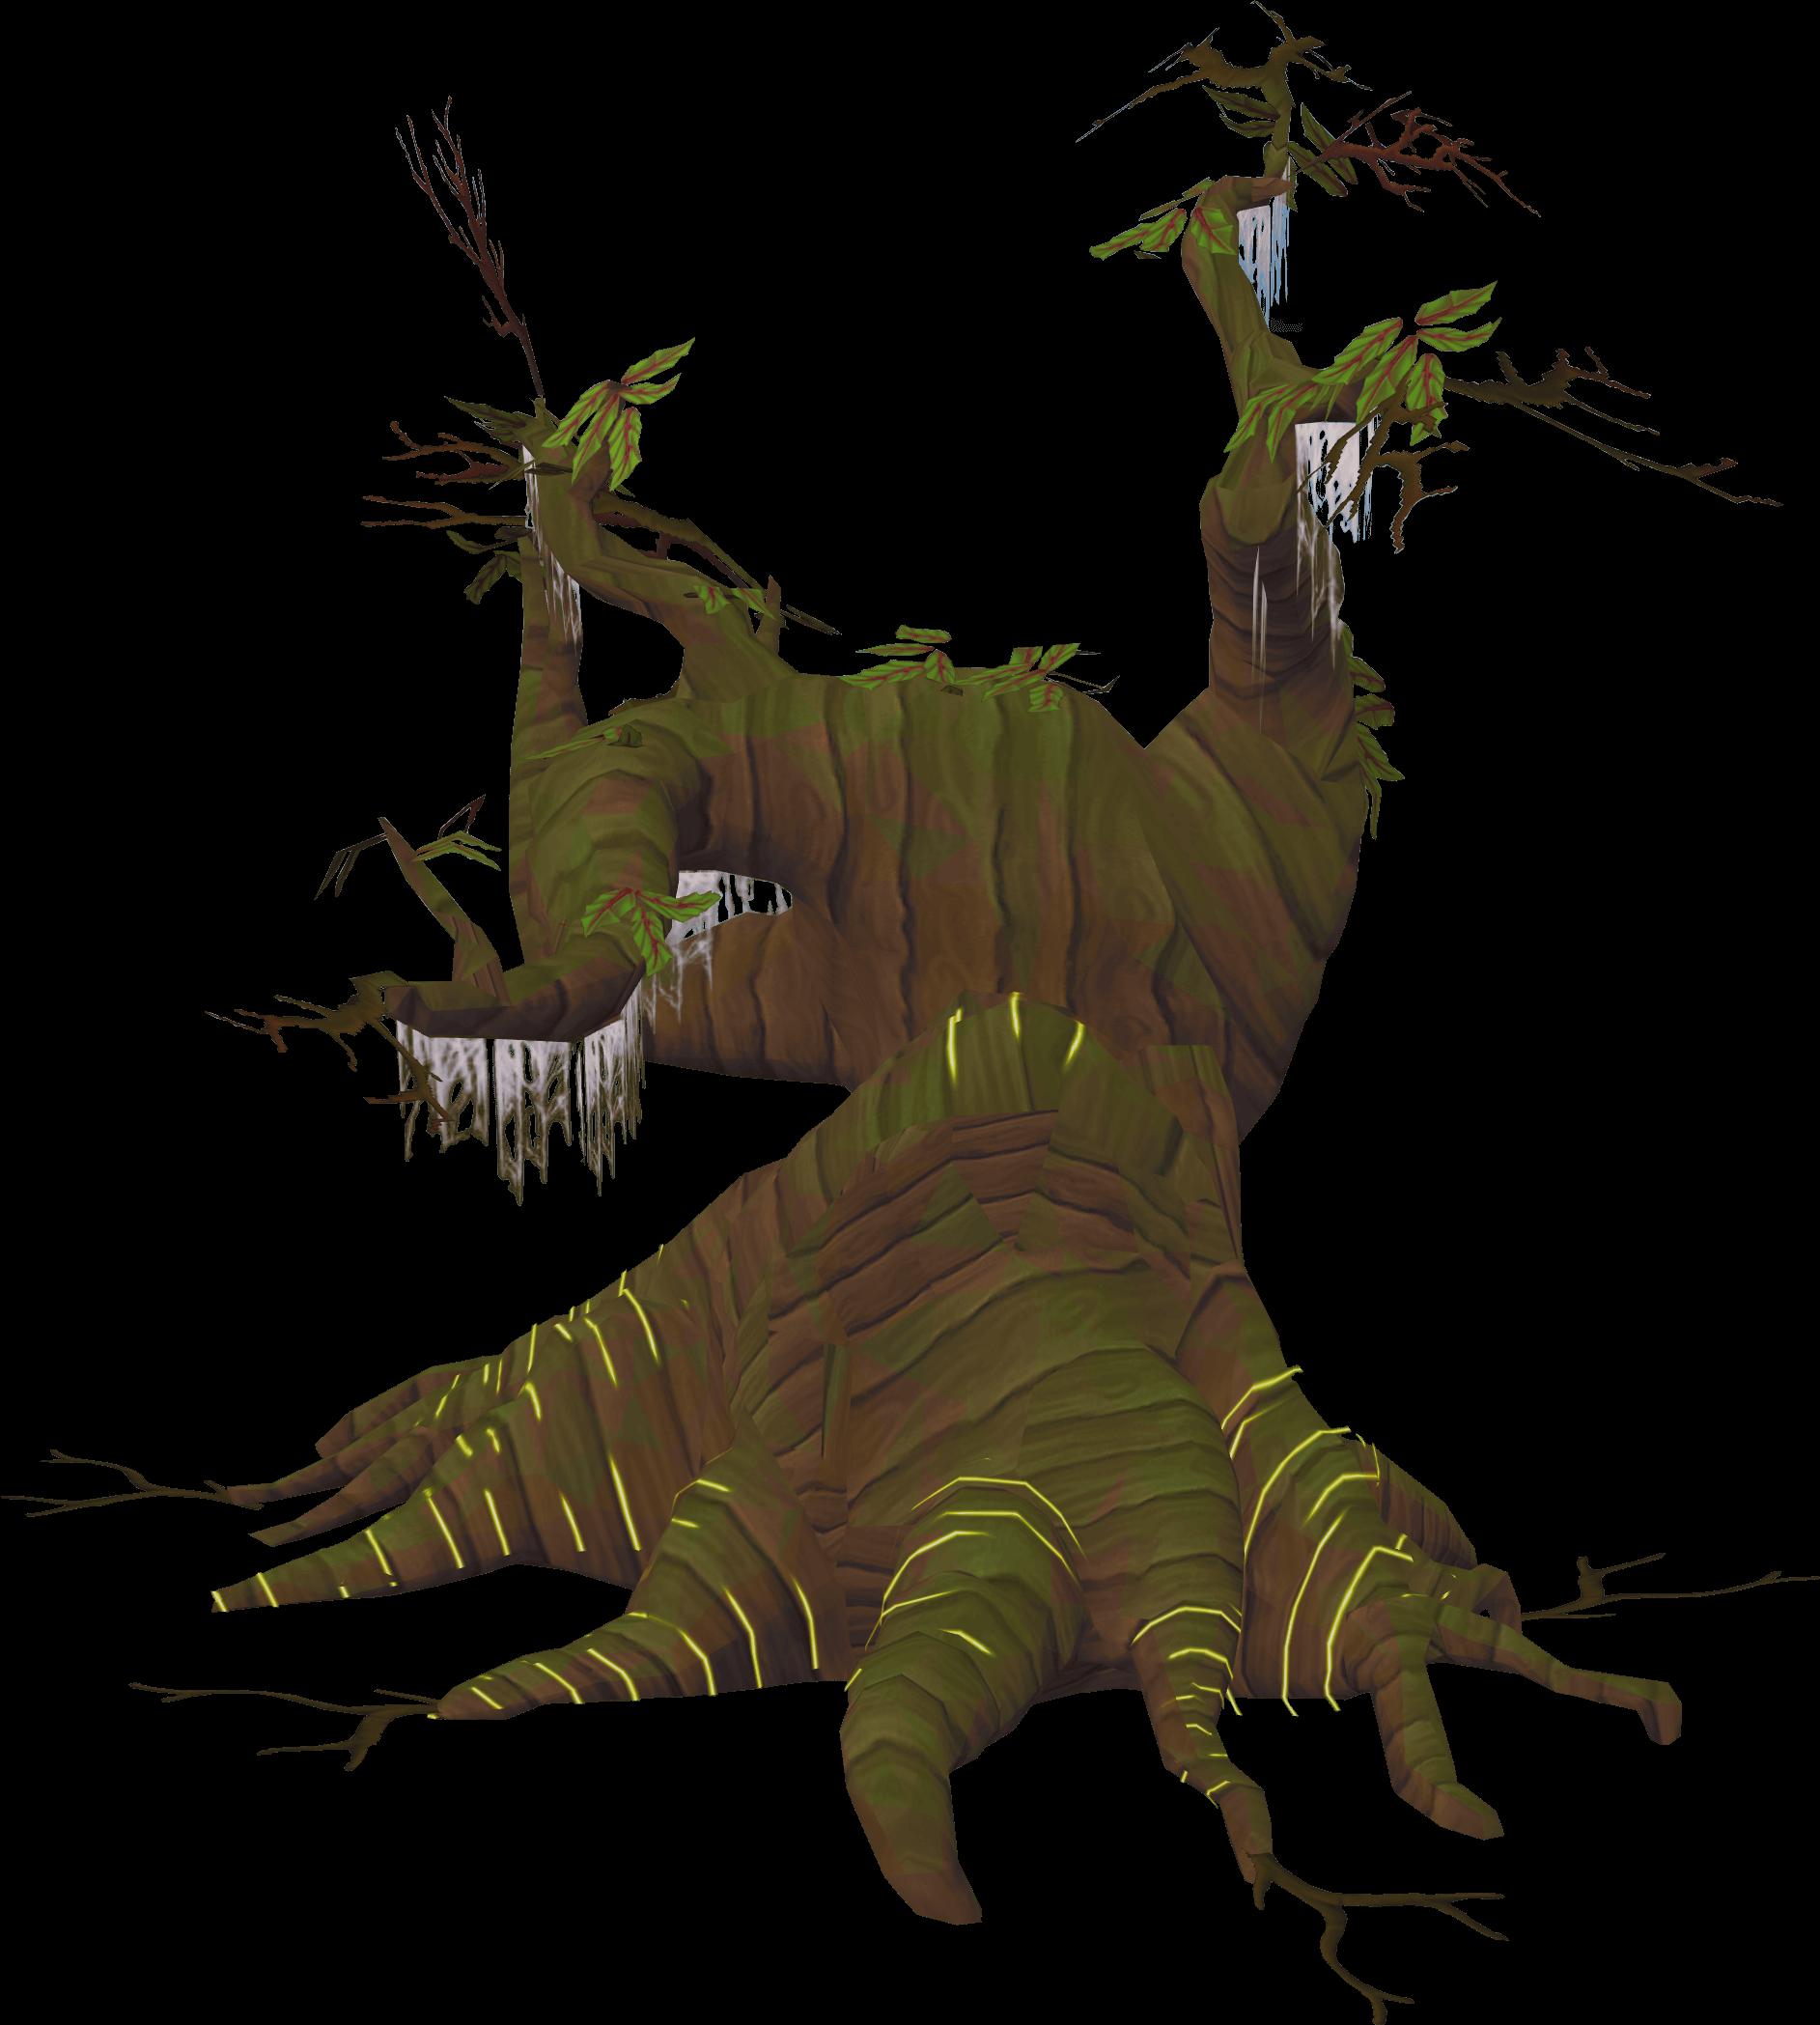 Runescape Fruit Trees Part - 20: Elder Tree